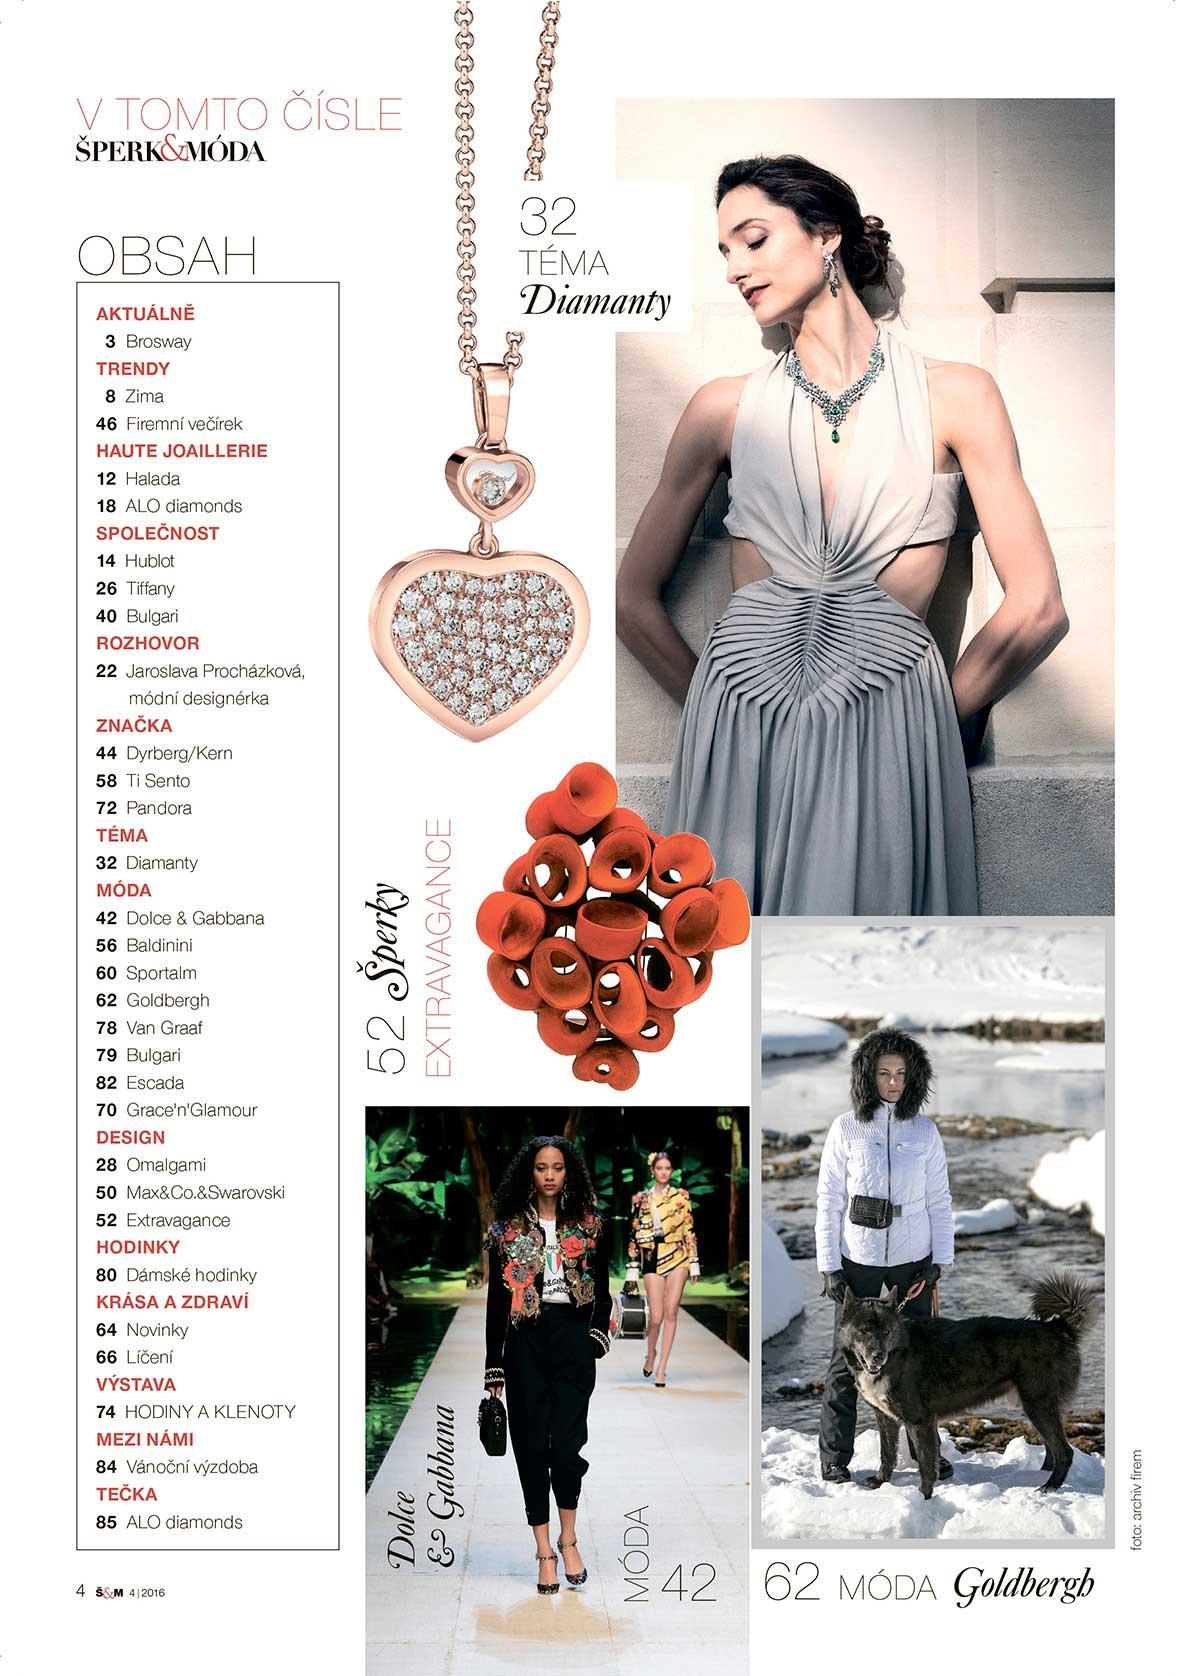 Sperk&Moda_04_2016_Omalgami-Olga-Beleacova-jeweler-Exclusive-Jewelry-Silver-magazine-2